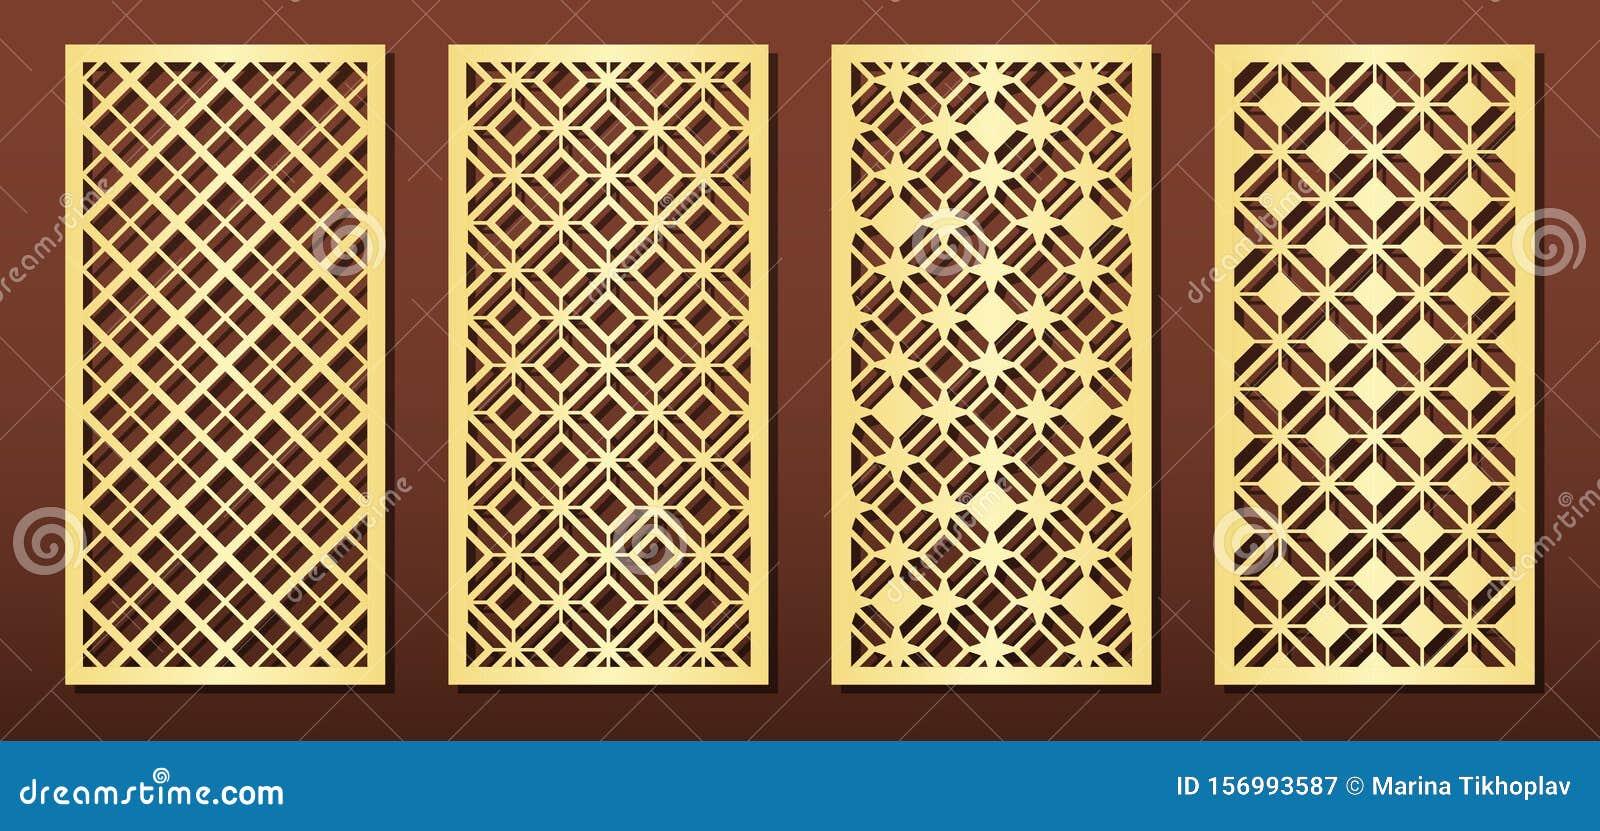 Laser Cut Panels Vector Set For Wood Or Metal Decor Arabic Geometric Pattern Stock Vector Illustration Of Islamic Engraving 156993587